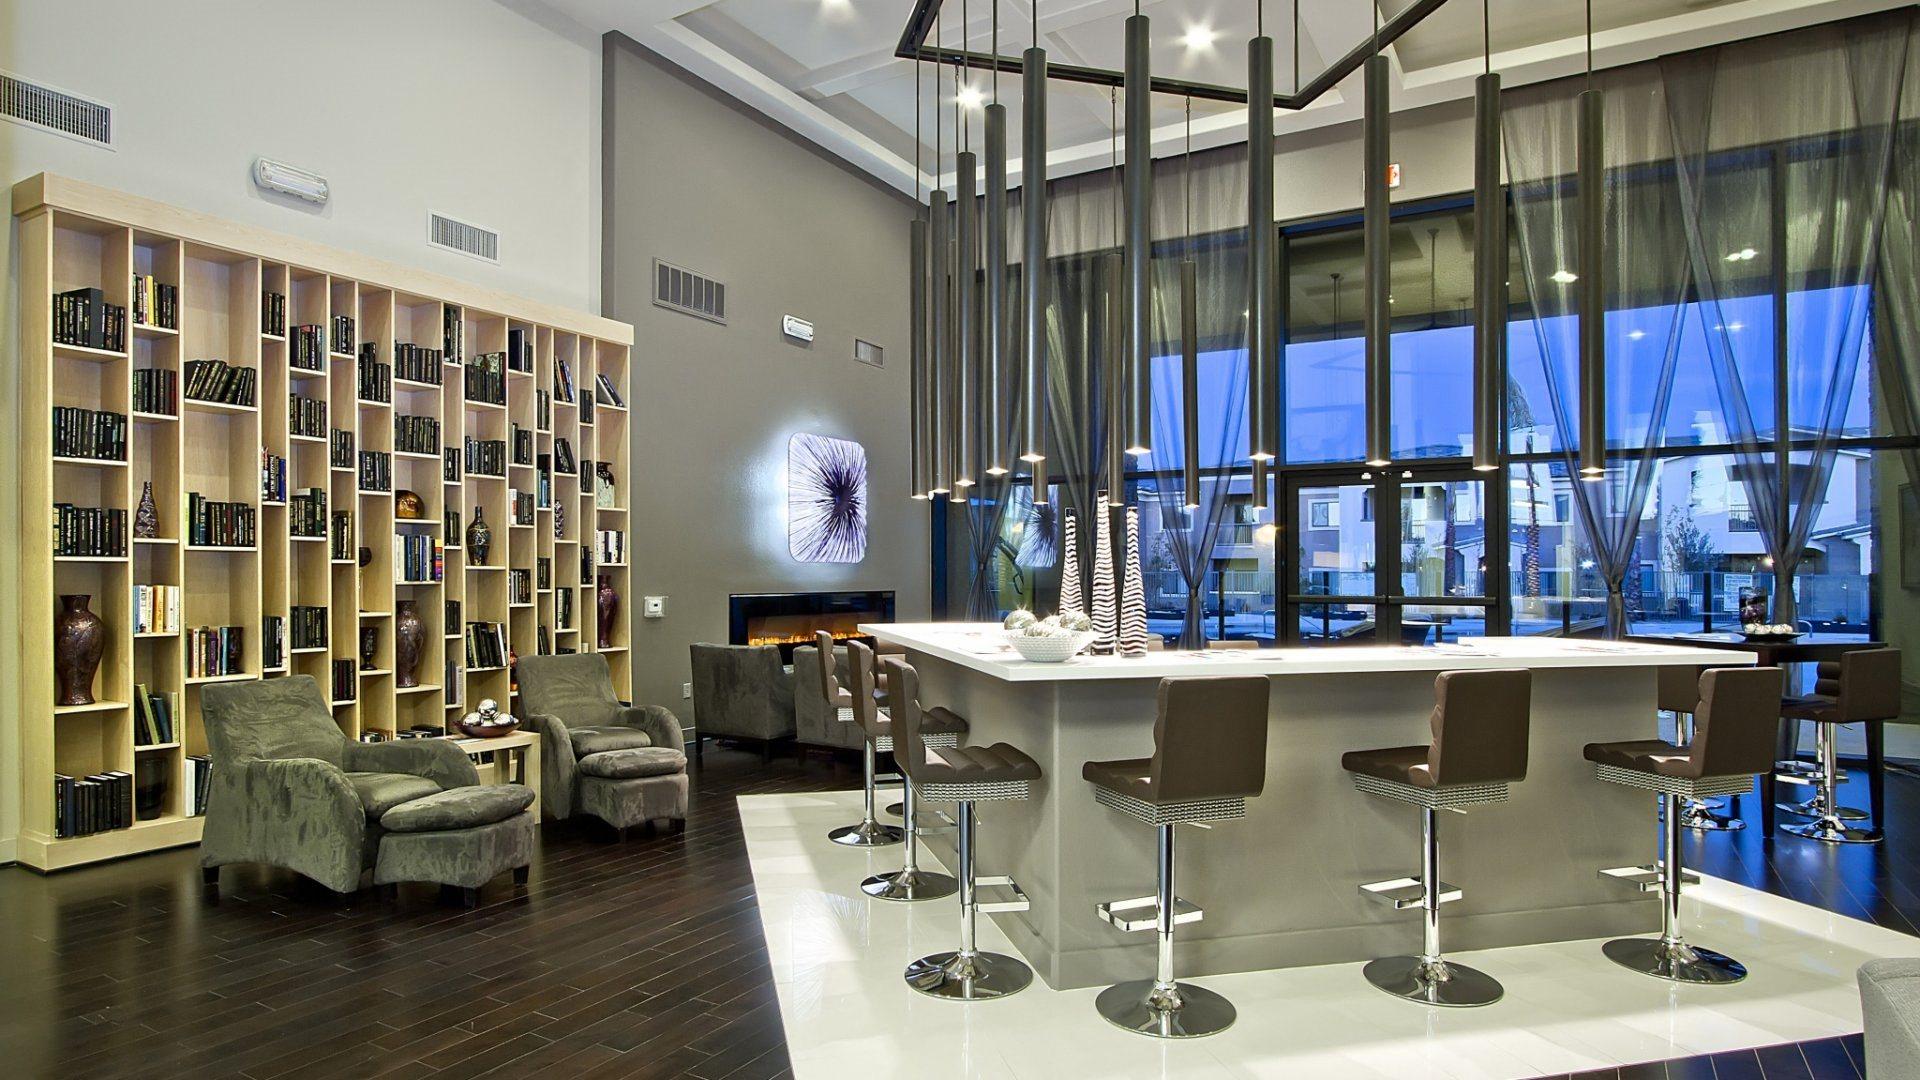 Gourmet Coffee Bar at South Blvd, Nevada, 89183